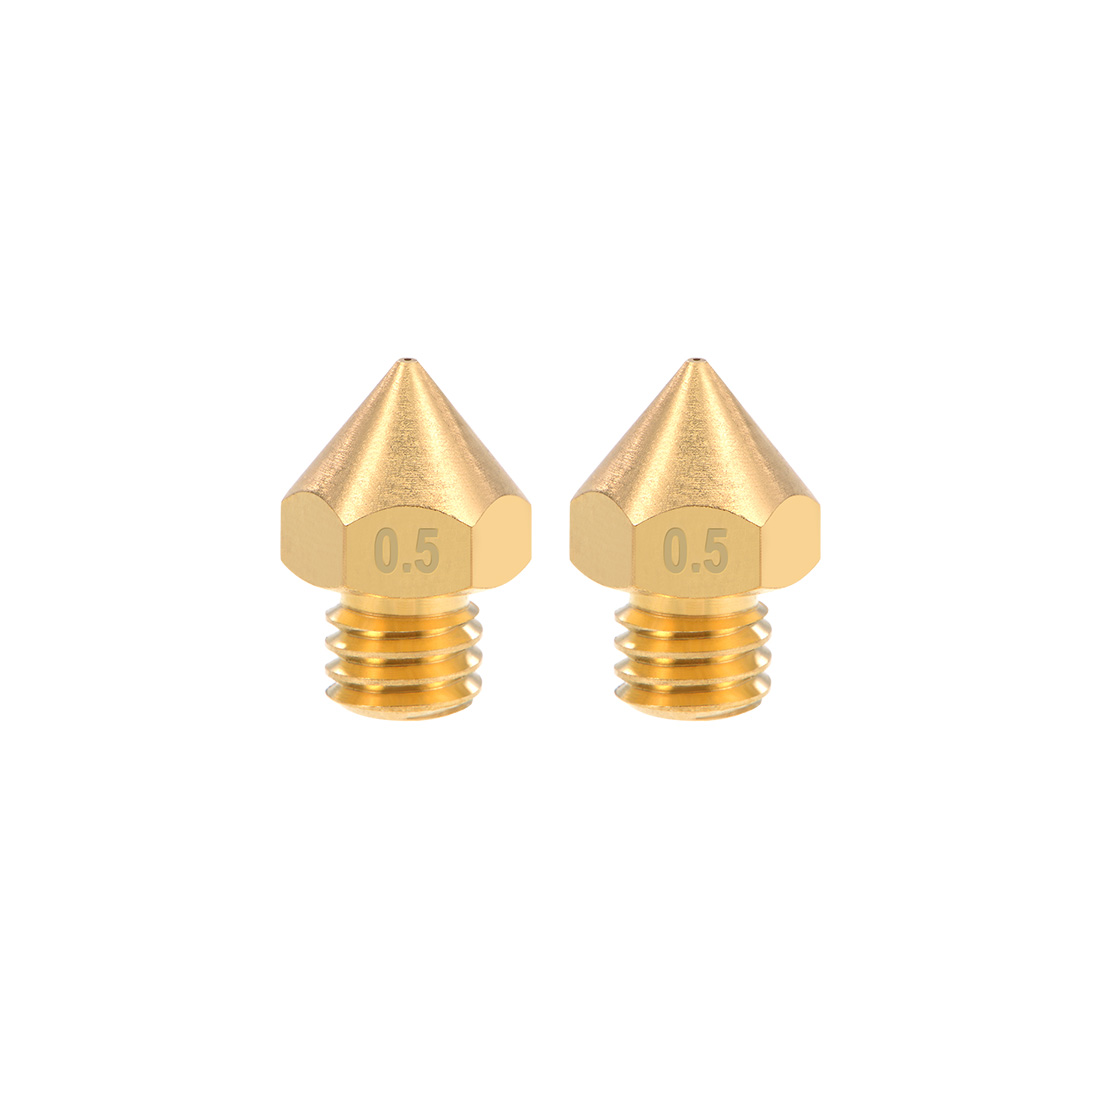 0.5mm 3D Printer Nozzles Head M6 Thread MK8 1.75mm Extruder Print Brass 2pcs